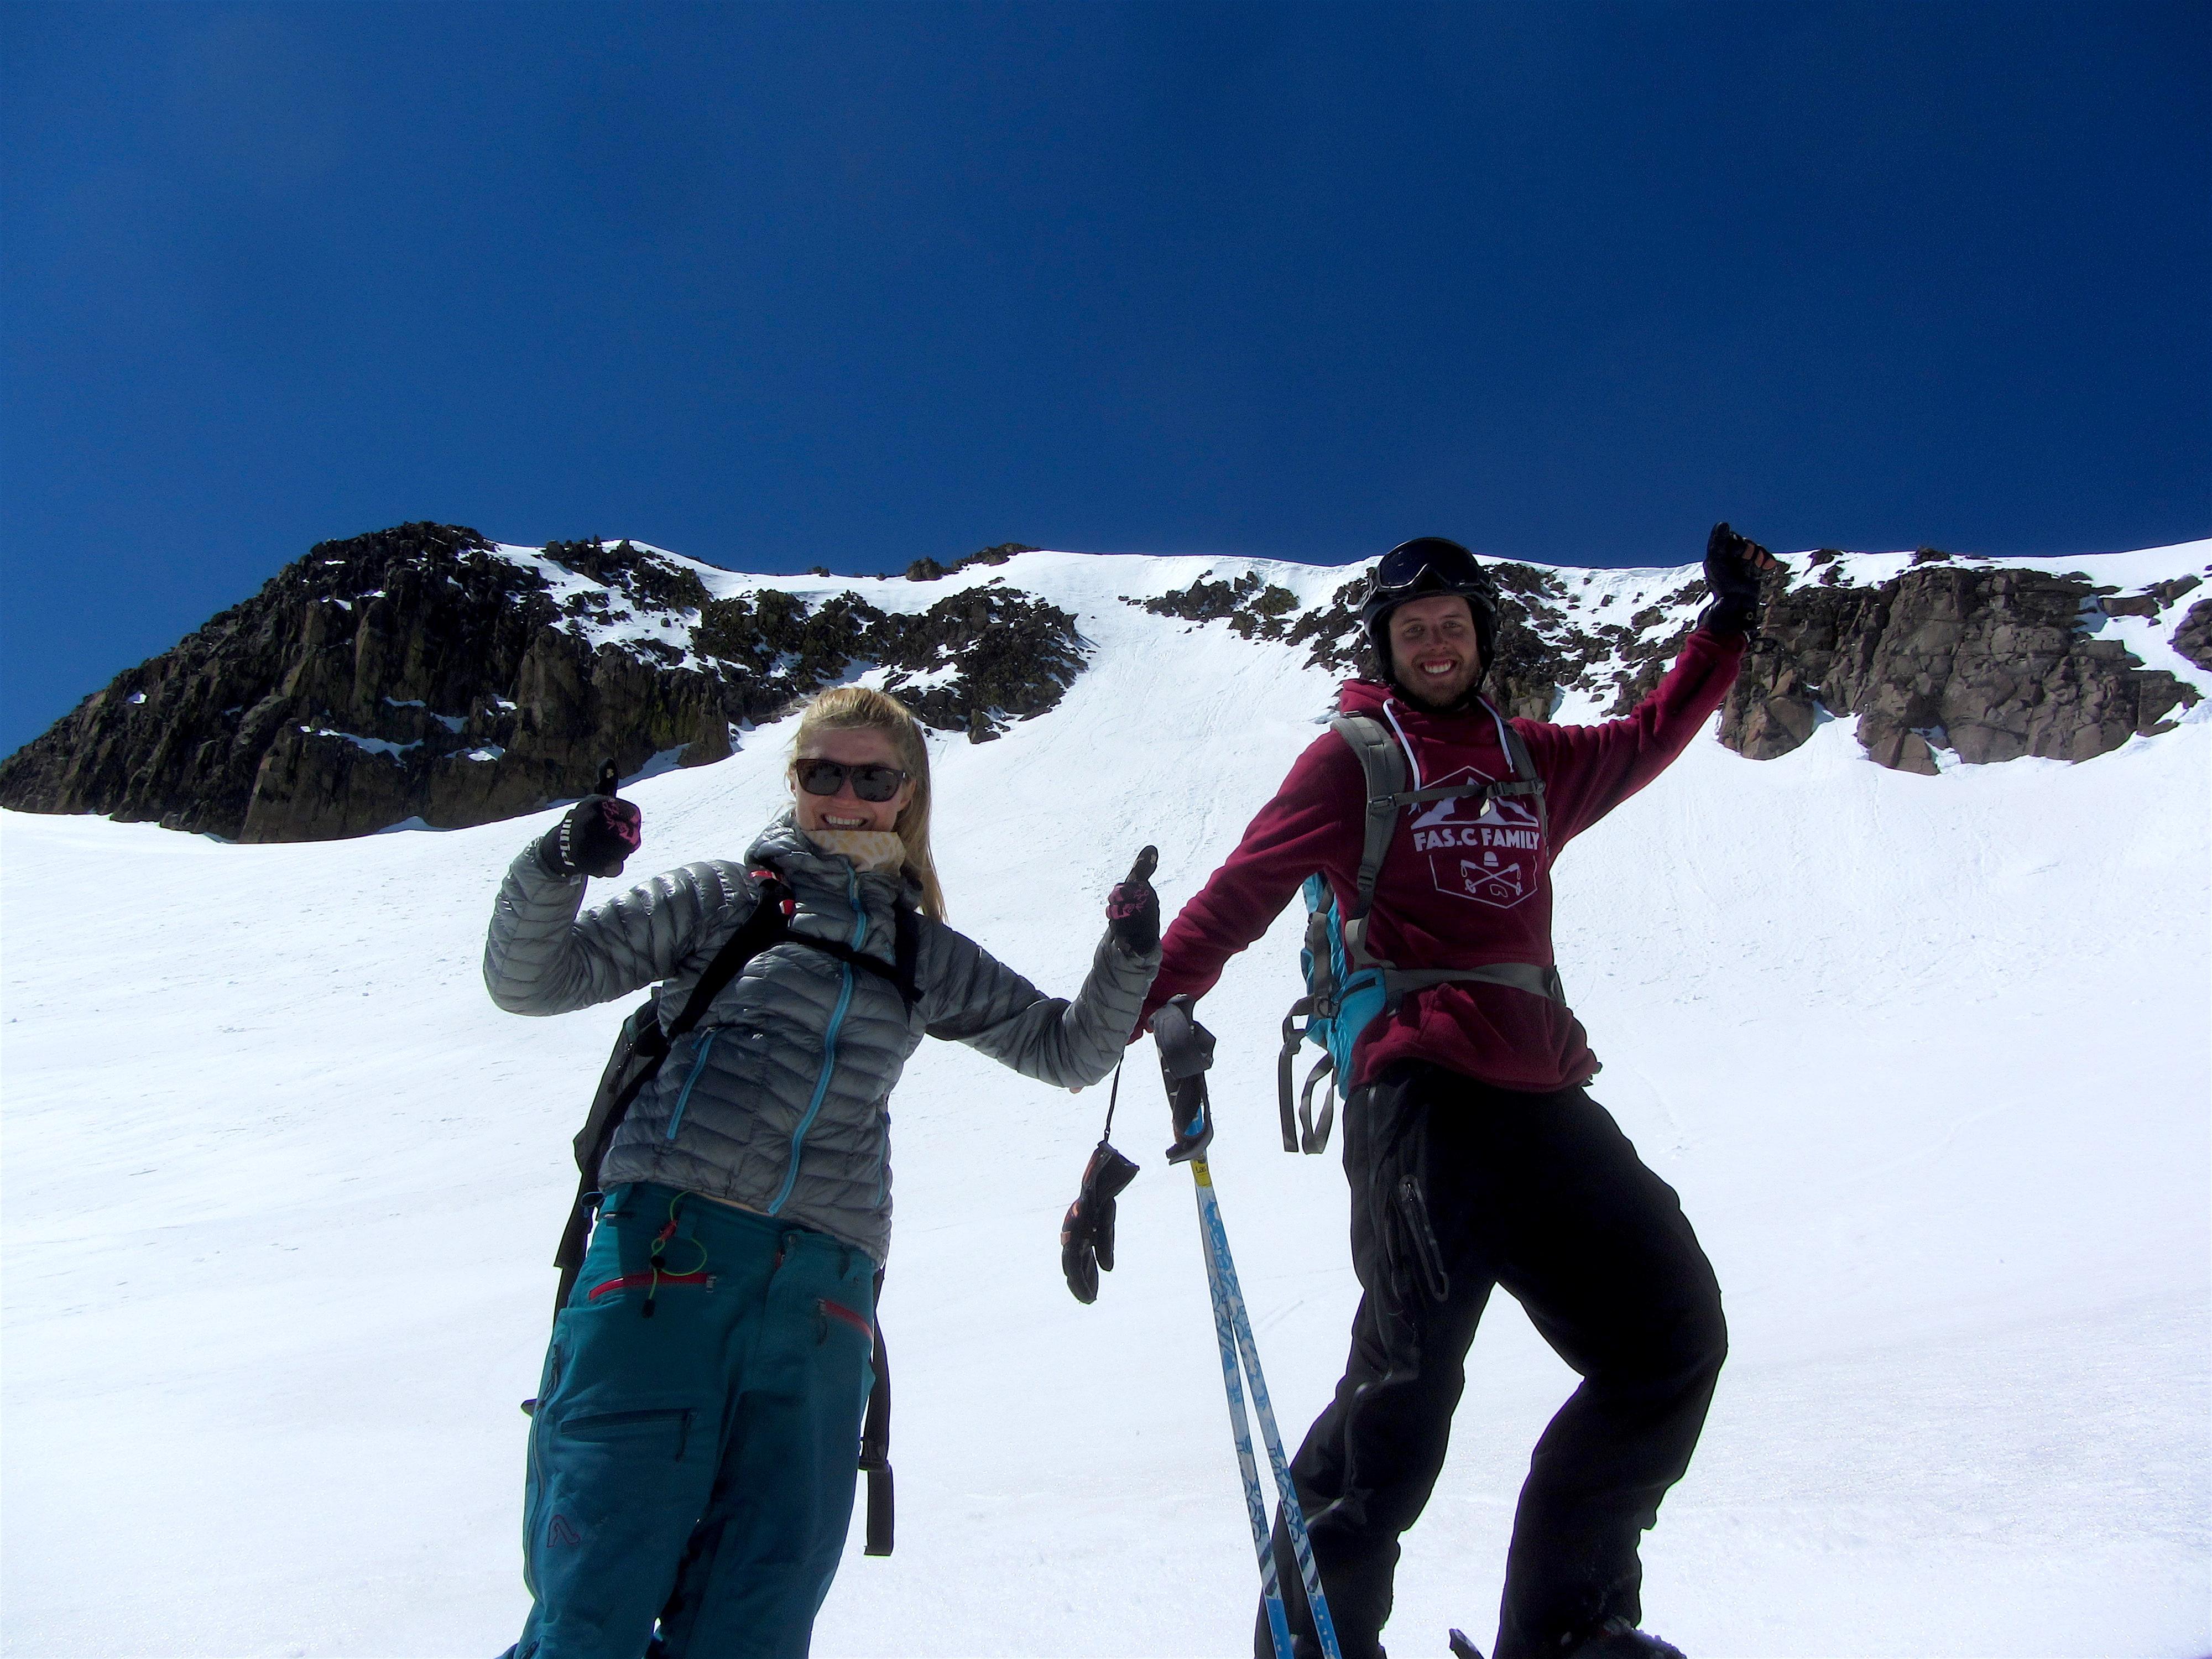 Post ski stoke. photo: miles clark/snowbrains